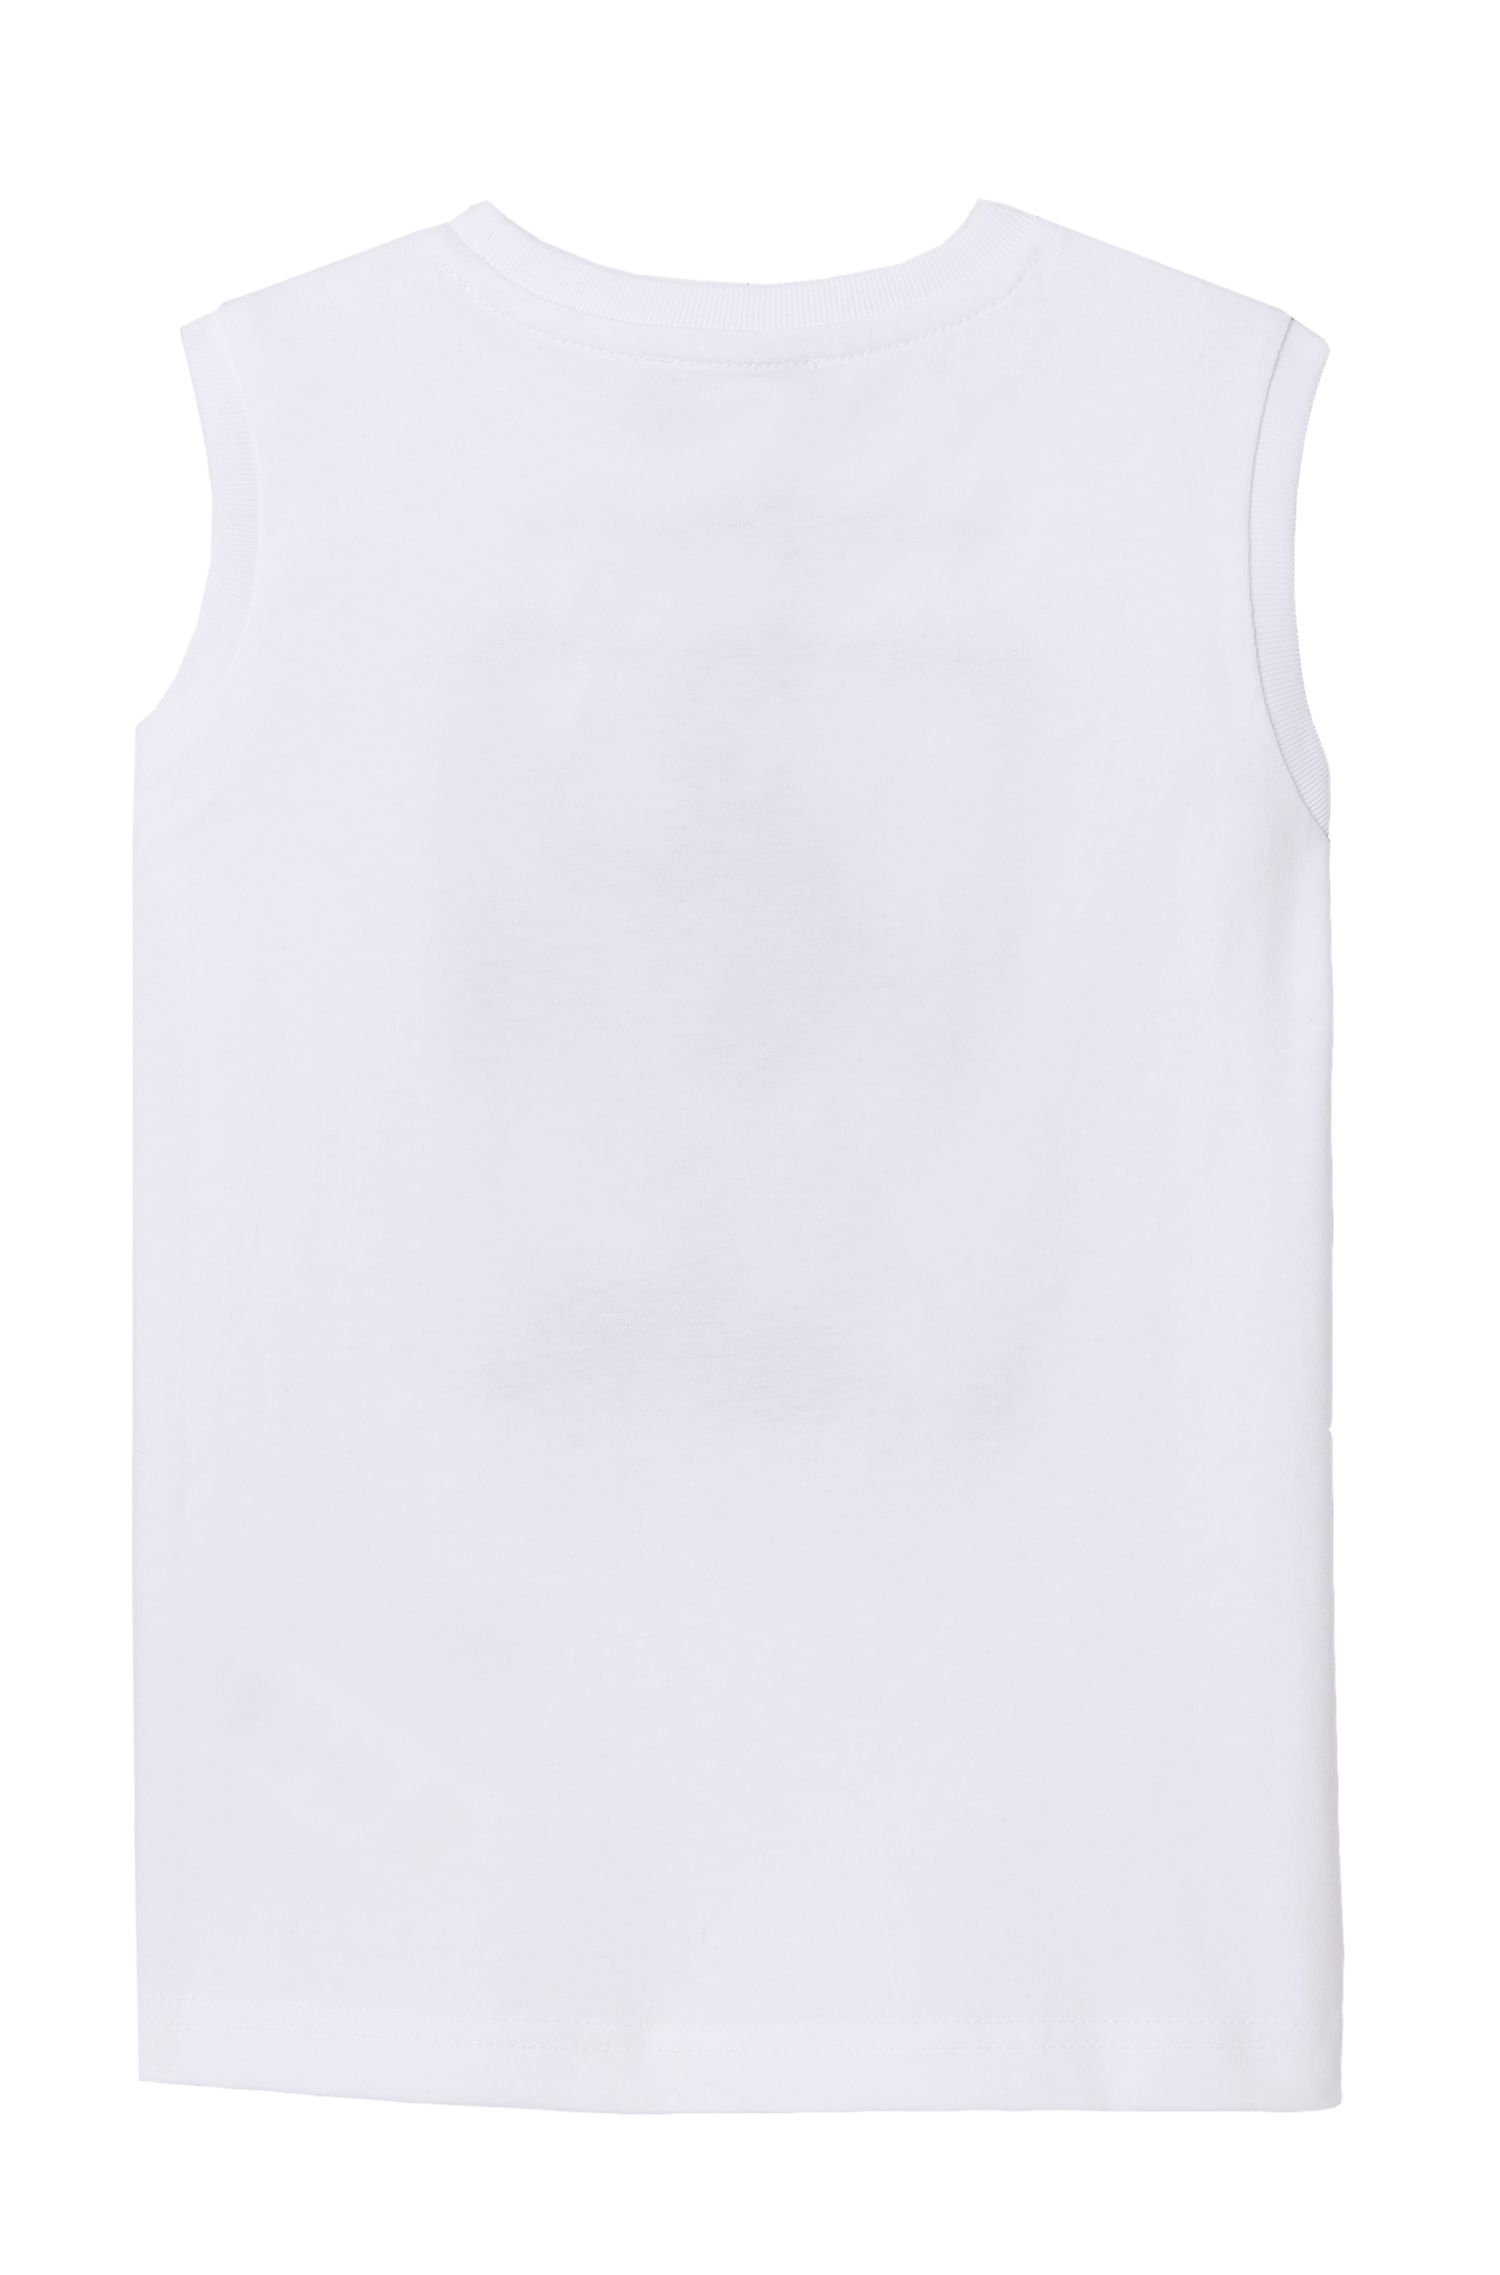 'J25926' | Boys Cotton Blend Graphic Tank Top